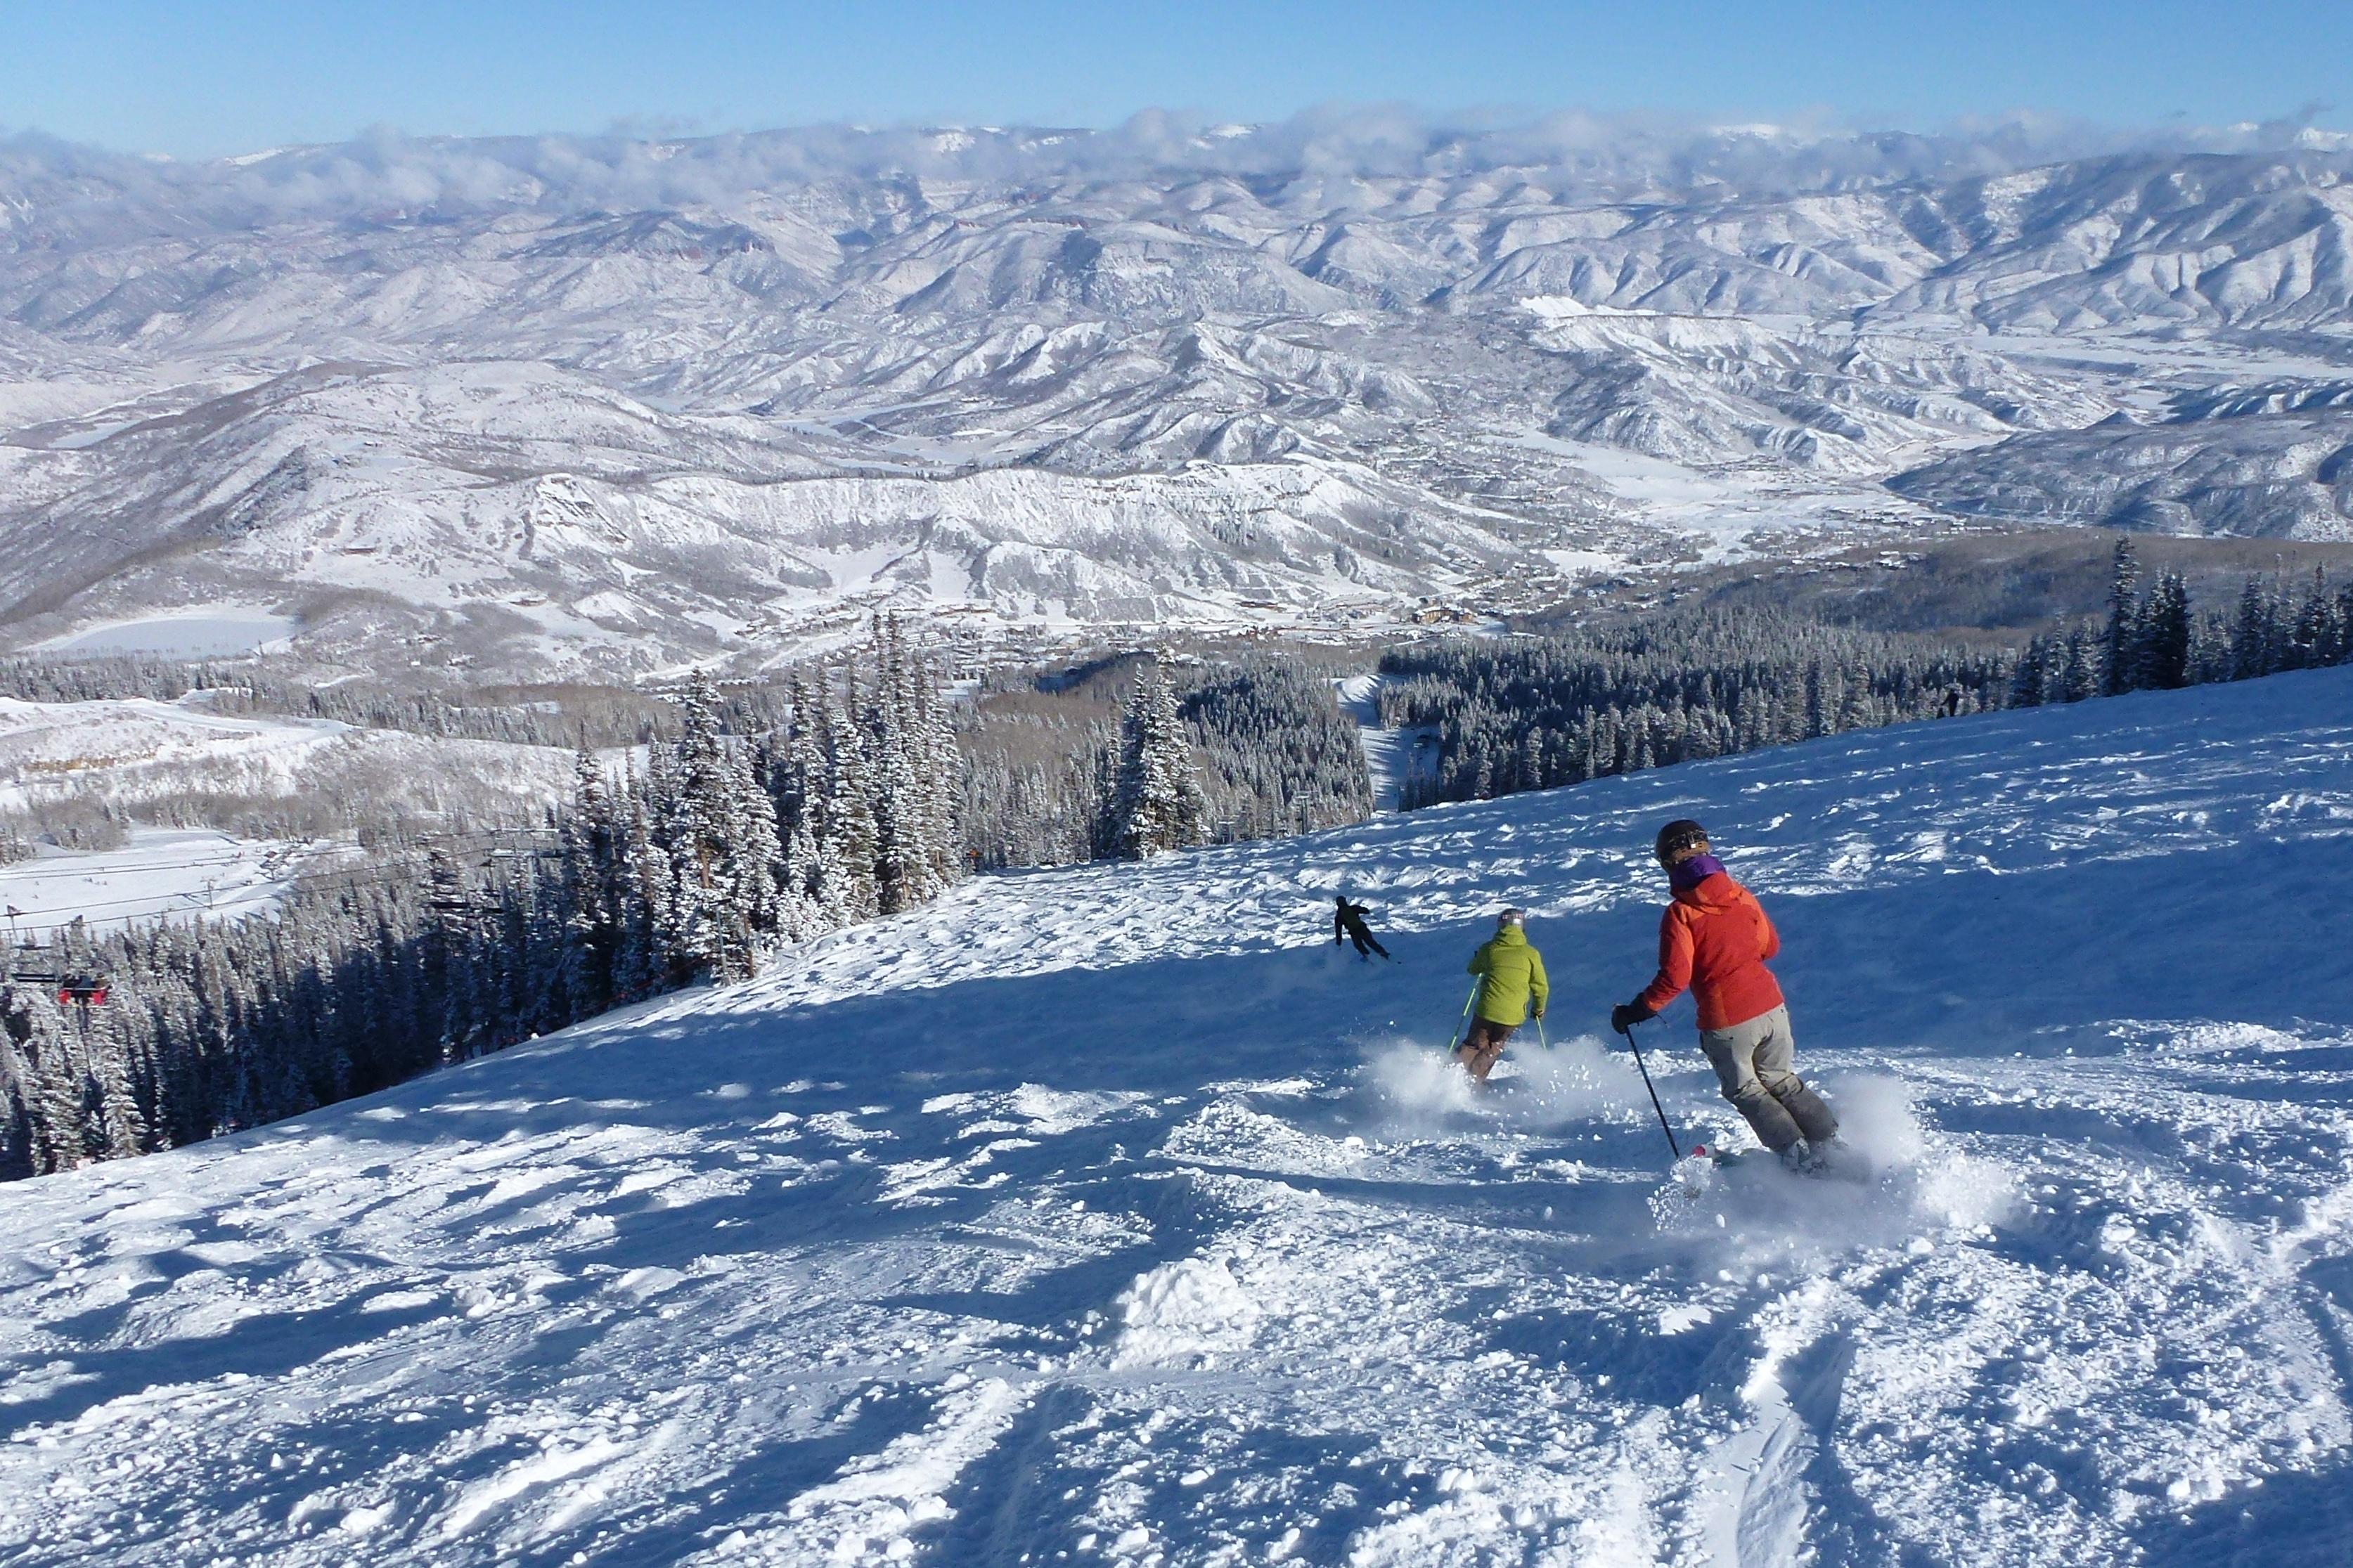 Arctic Edge Snowboard Gear & Ski Equipment